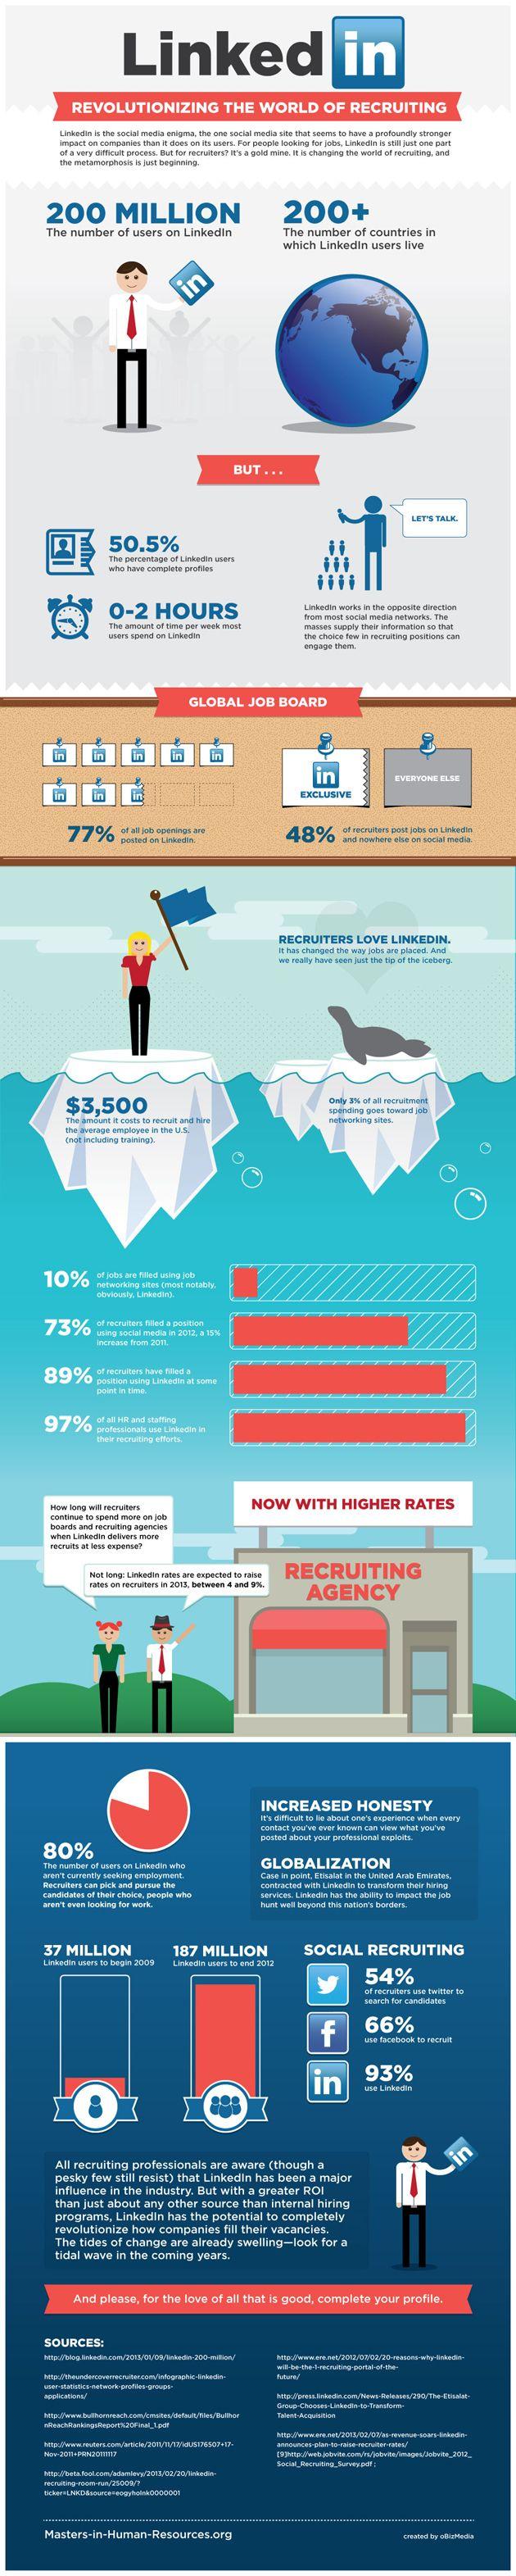 Infographic: LinkedIn Transforms Job Recruiting